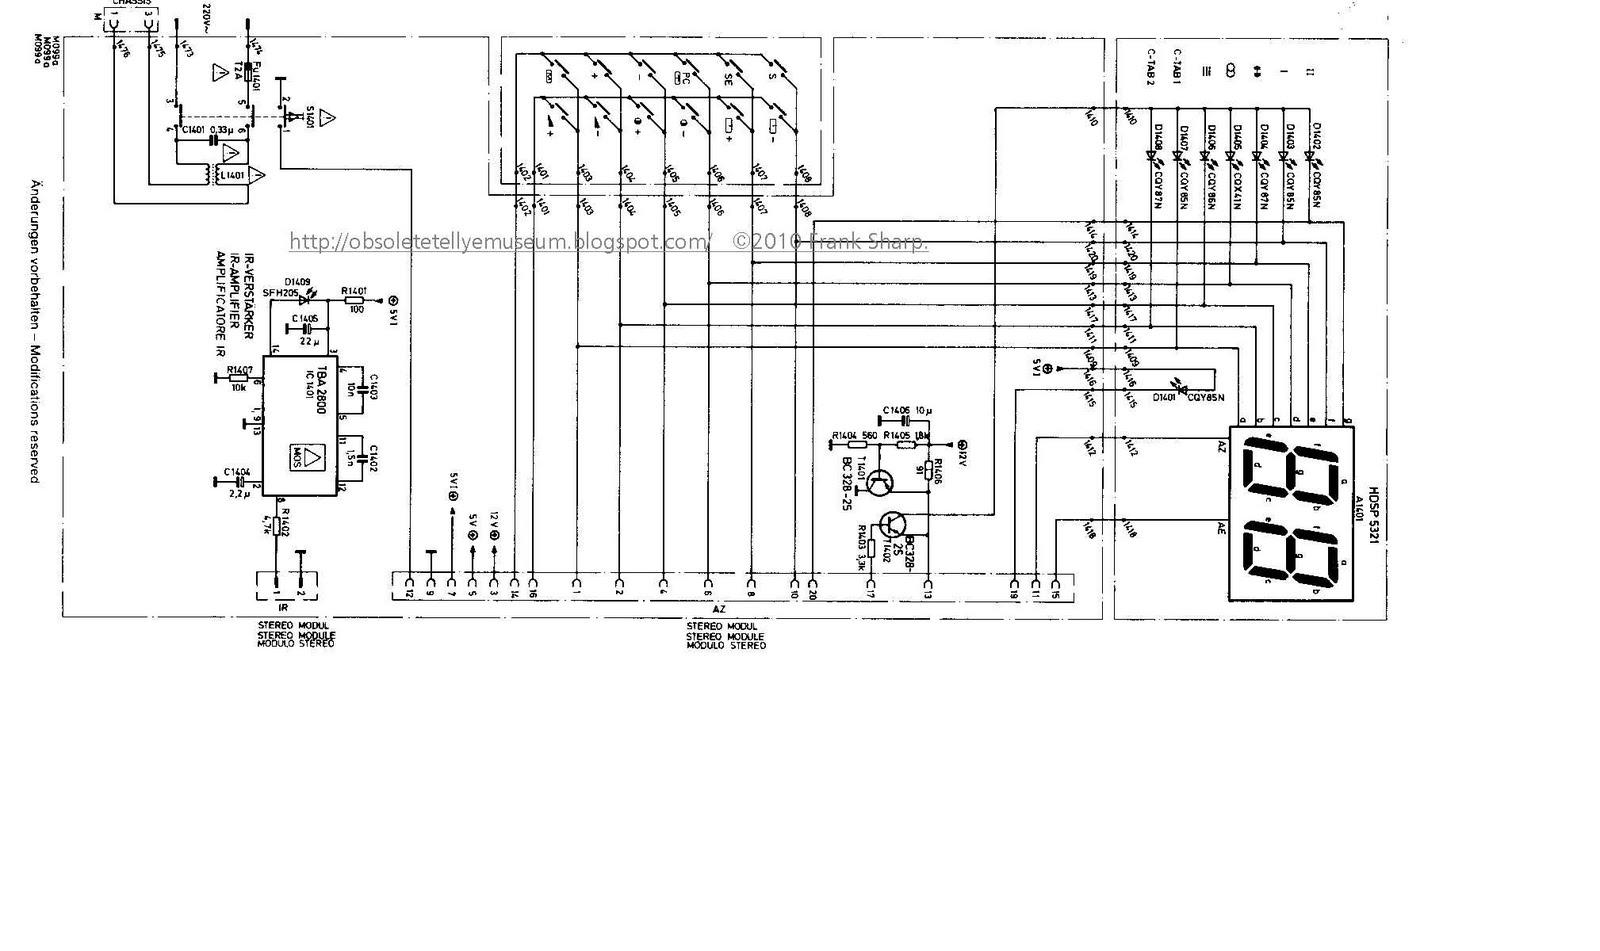 Obsolete Technology Tellye !: ITT DIGIVISION 3888 I HI FI